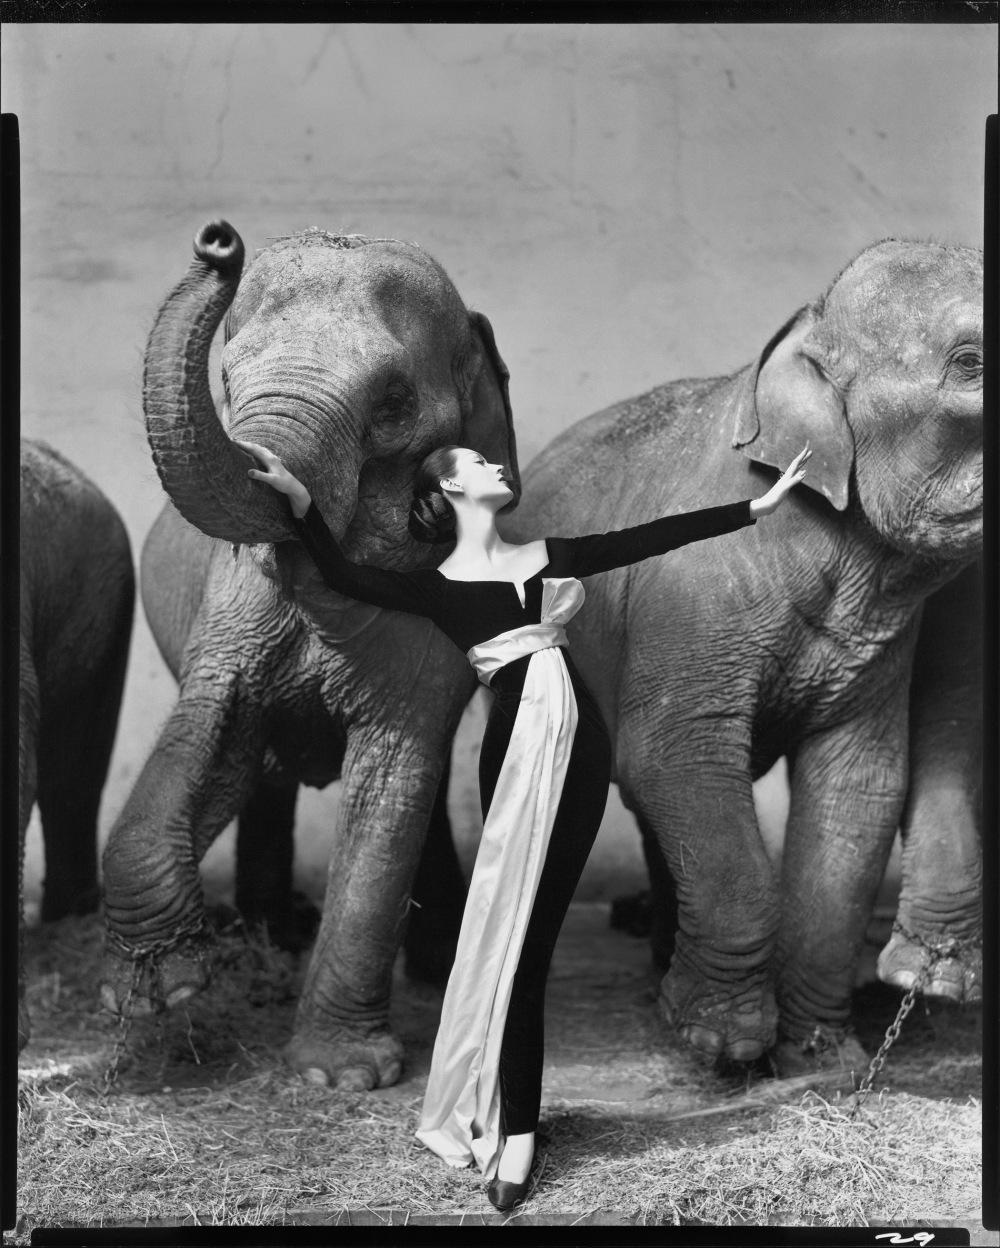 Dovima with elephants, Dior, Irving Penn